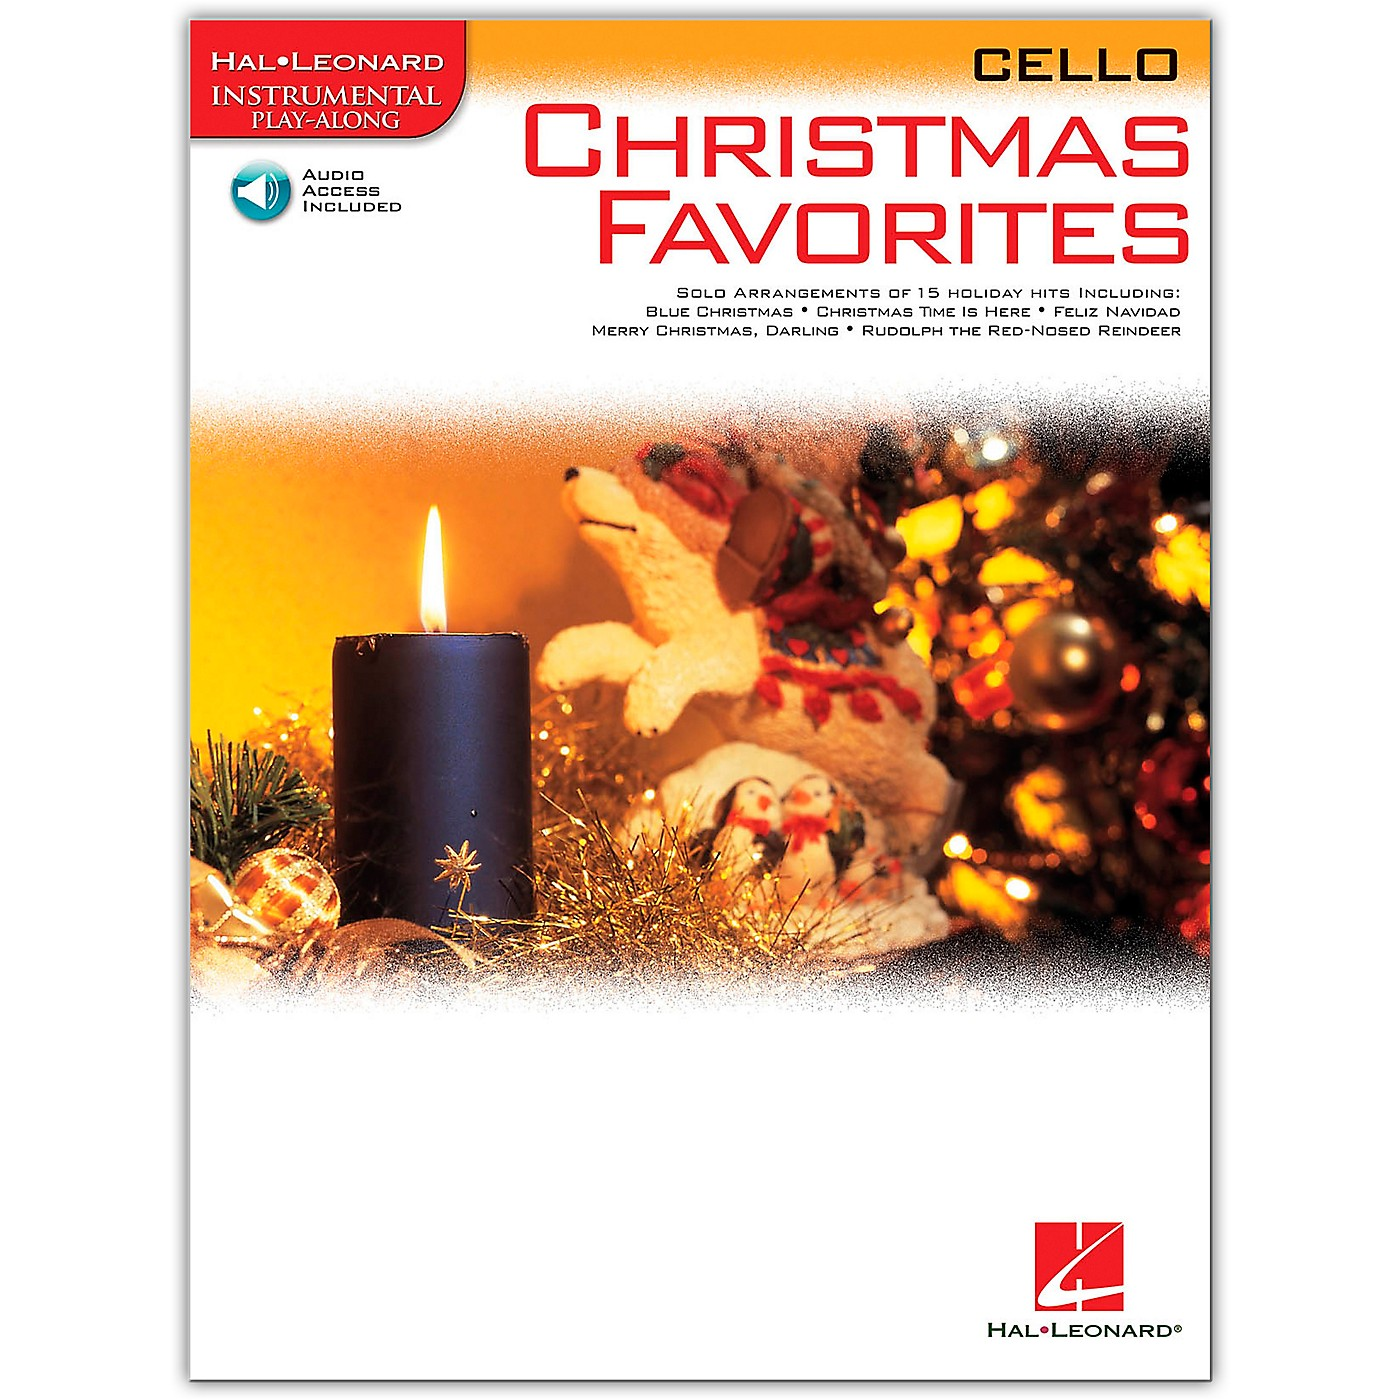 Hal Leonard Christmas Favorites for Cello Book/Online Audio Instrumental Play-Along thumbnail